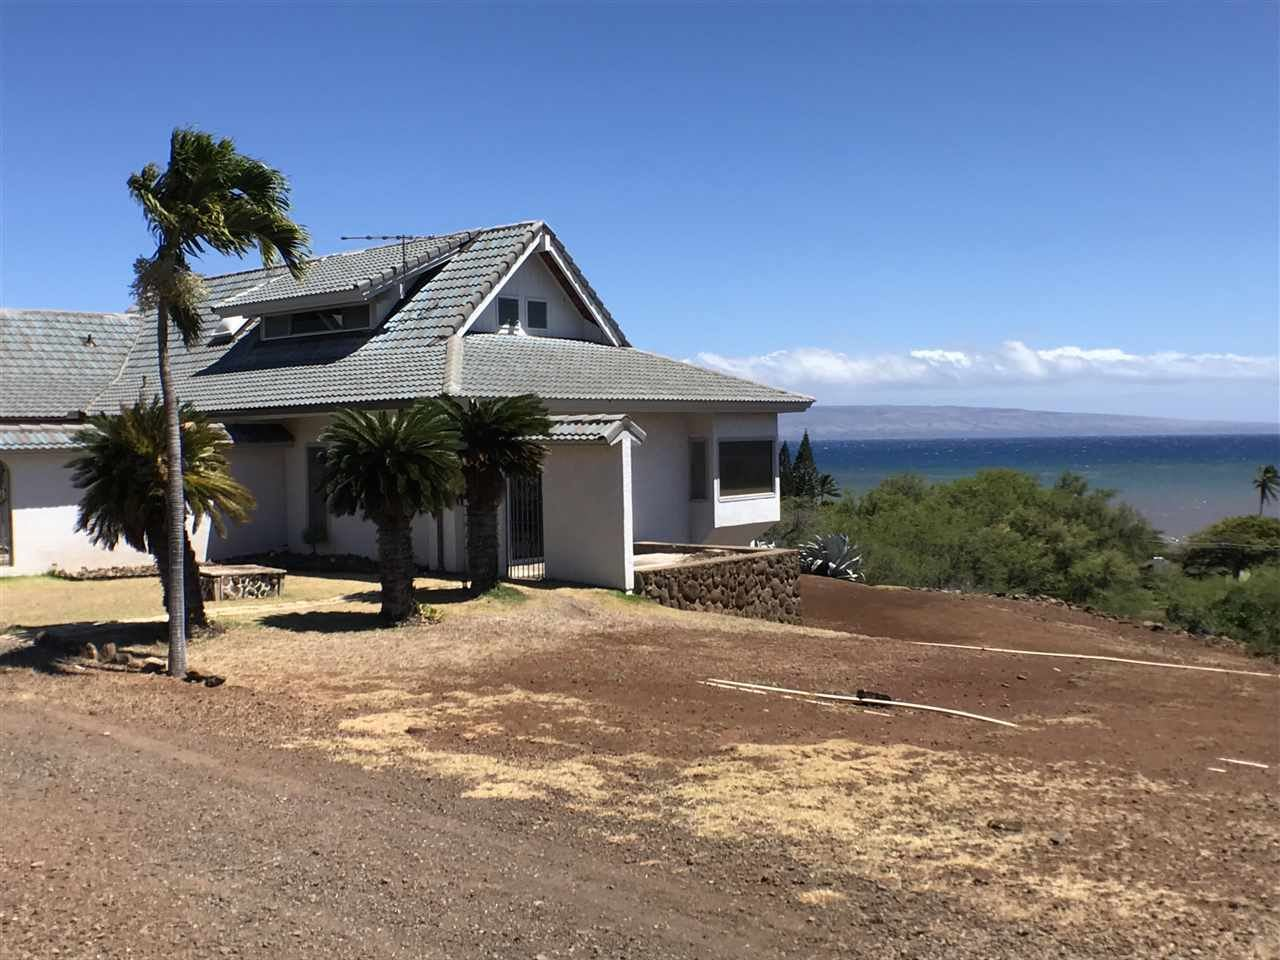 Photo of 113 ULUANUI Rd #Lot 113, Kaunakakai, HI 96748 (MLS # 391919)